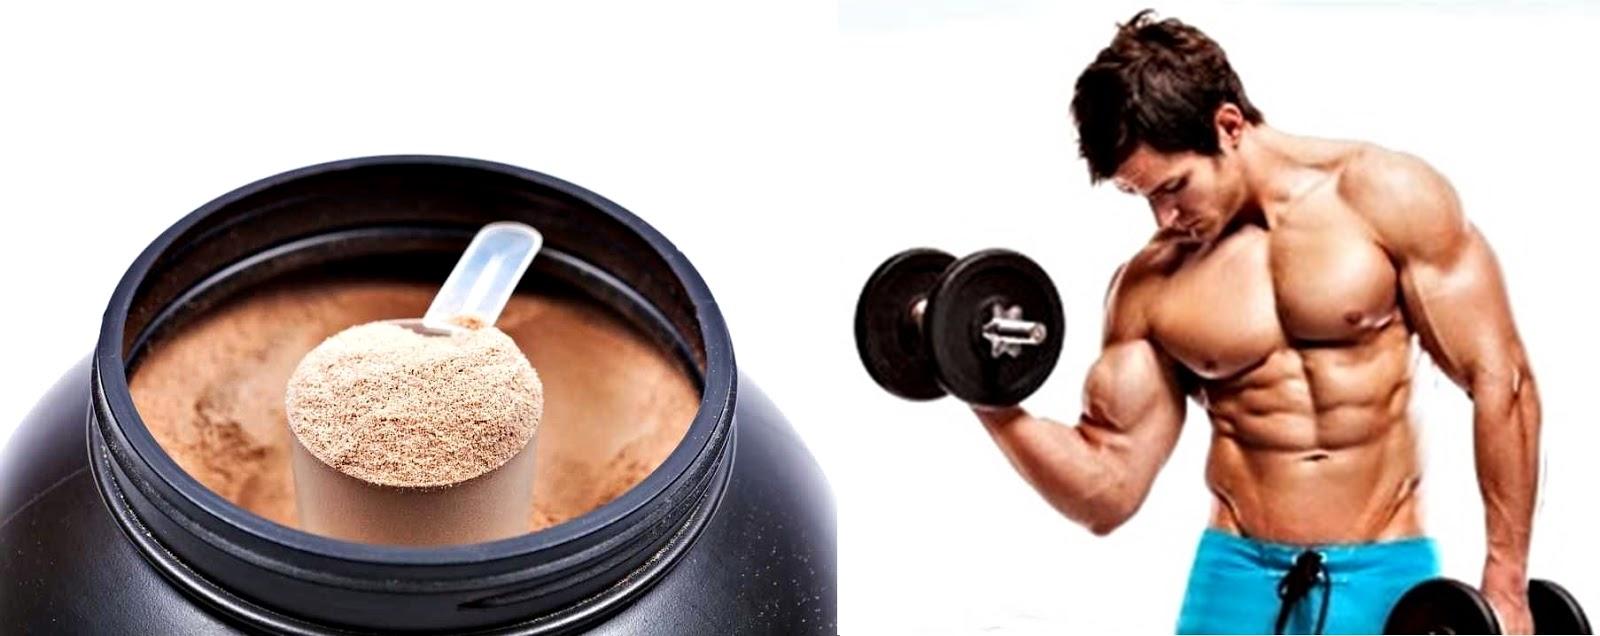 esteroides para aumentar musculatura